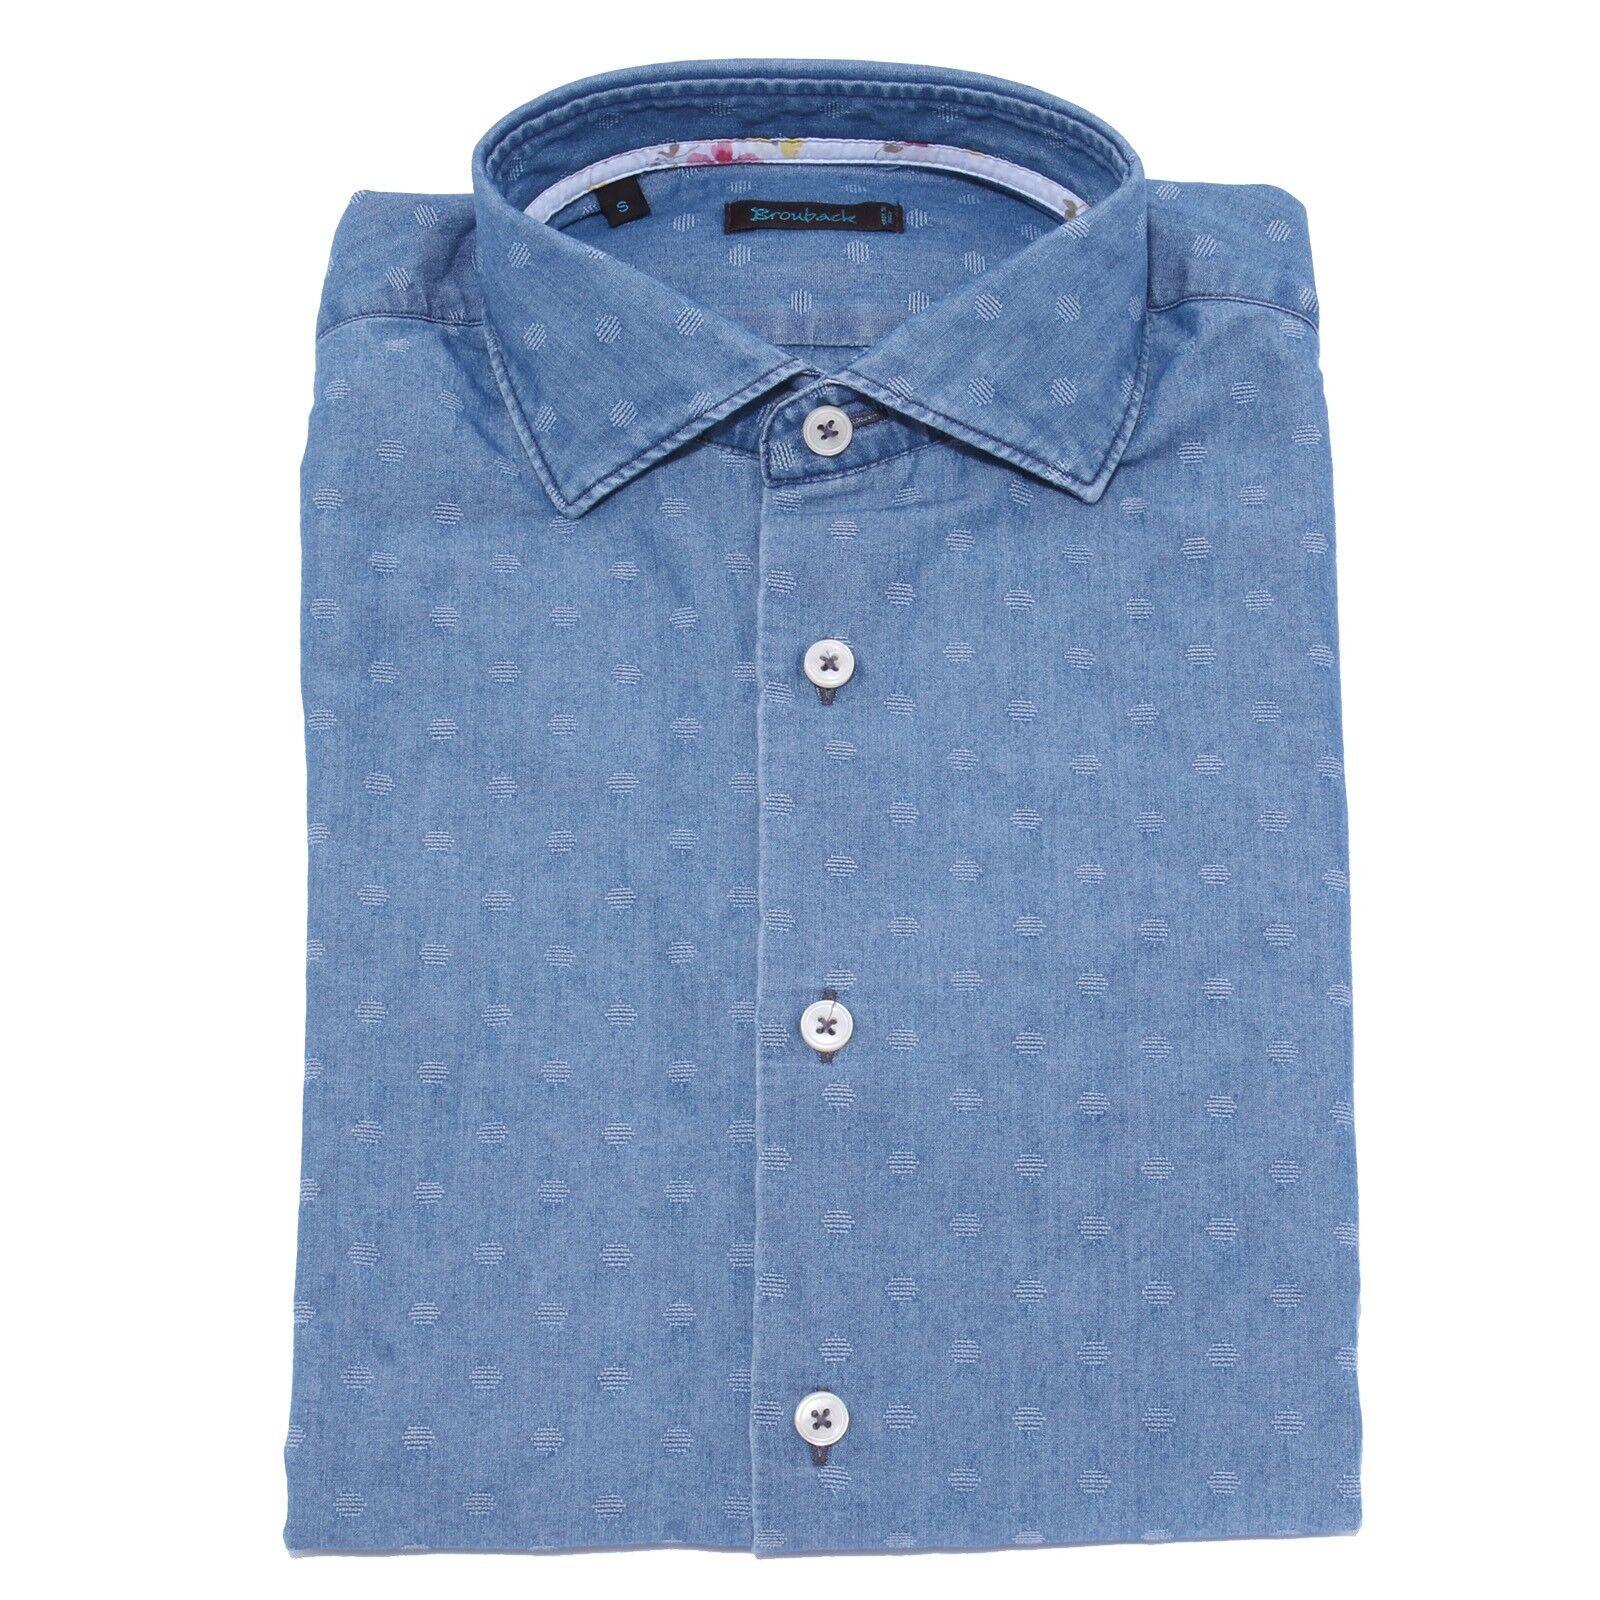 5078Y camicia uomo BROUBACK TEXTURED SHIRT light blu cotton man